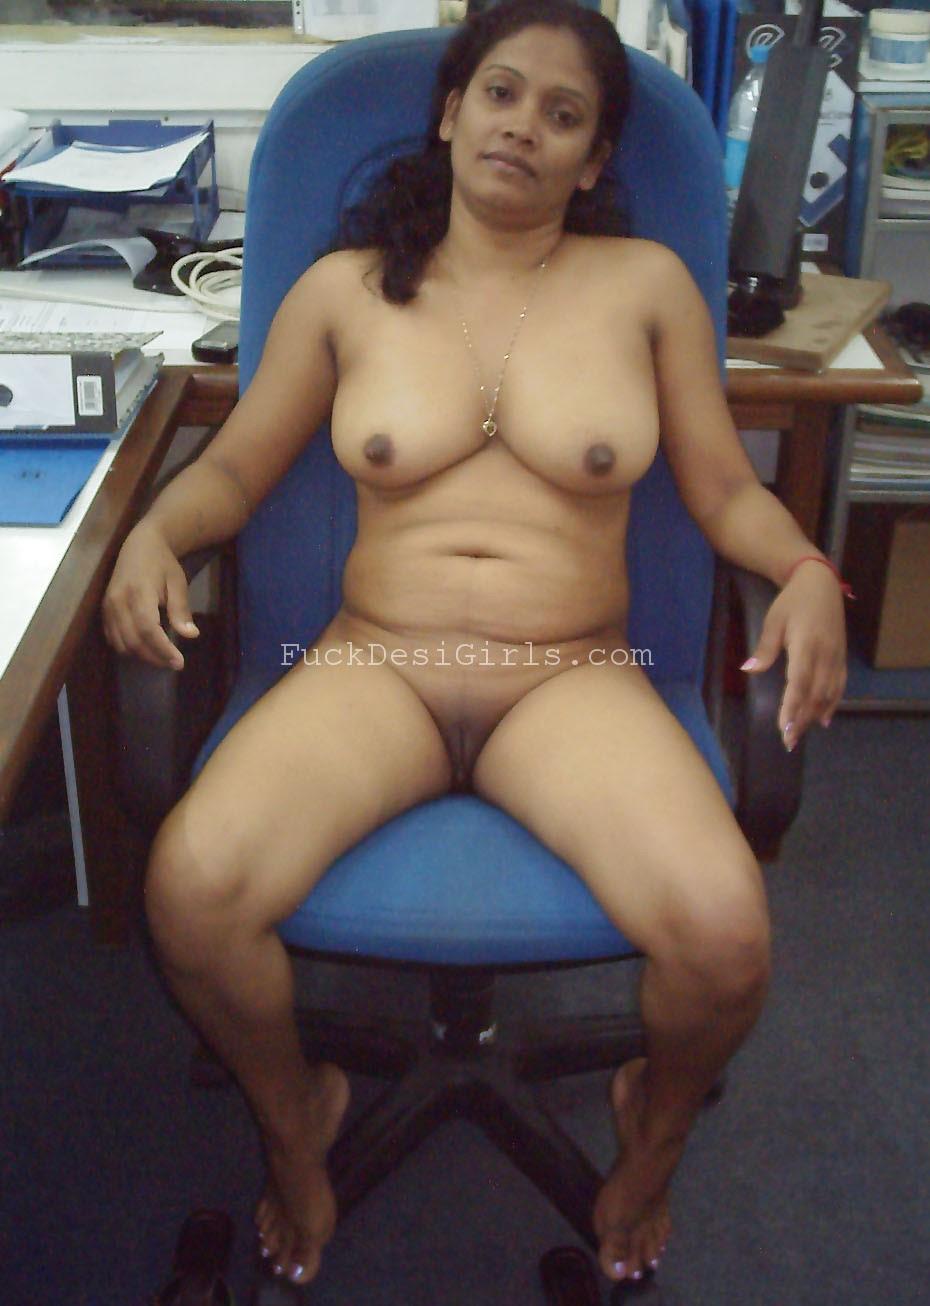 Nangi aunty naked porn sex Free Vagina Pictures